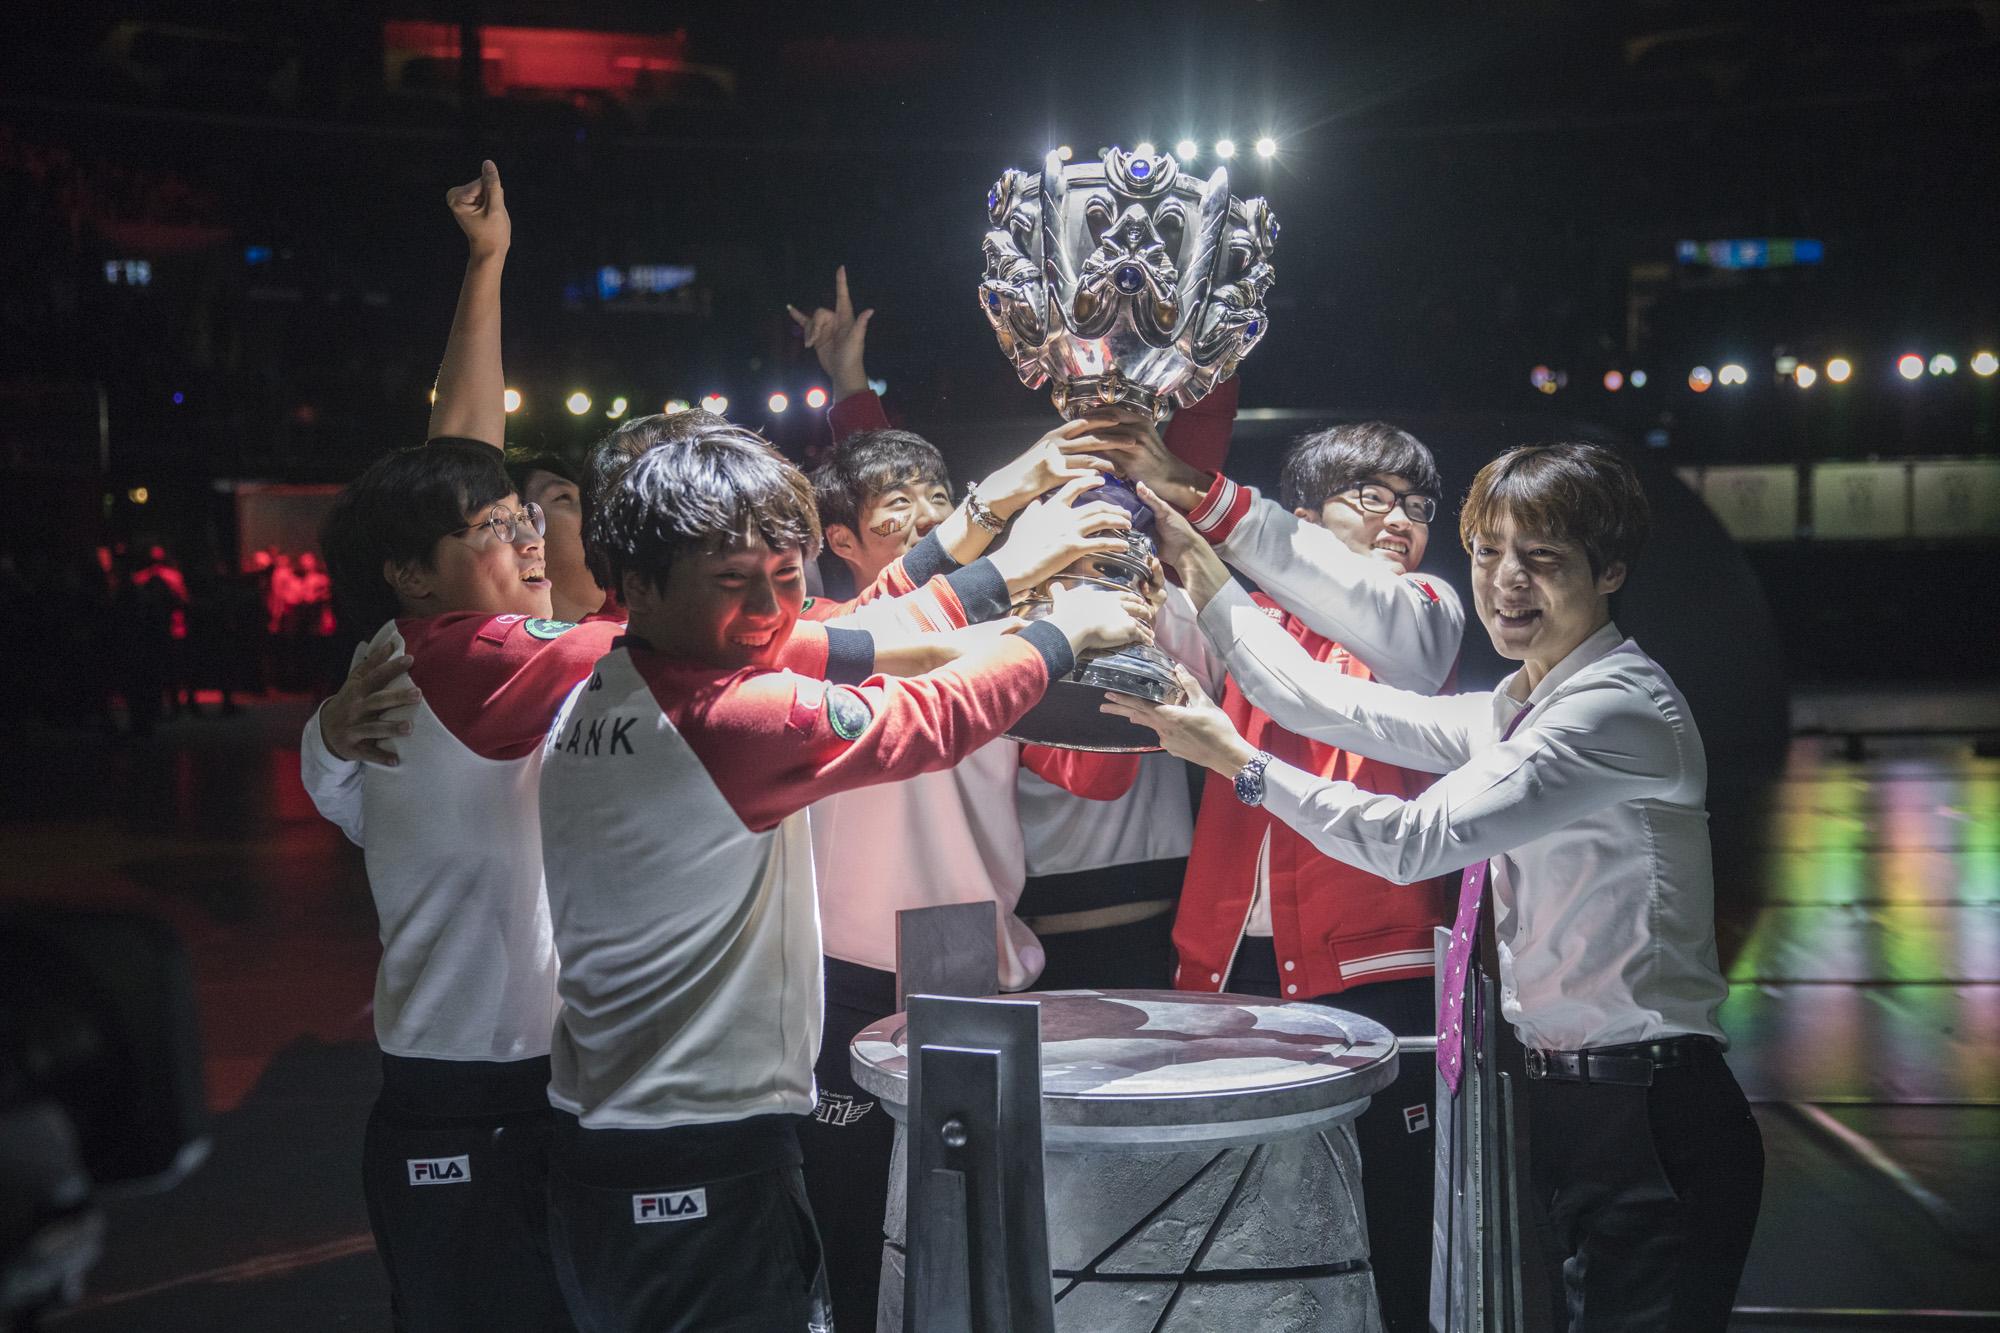 Mundial League of Legends LoL 2017 SK Telecom